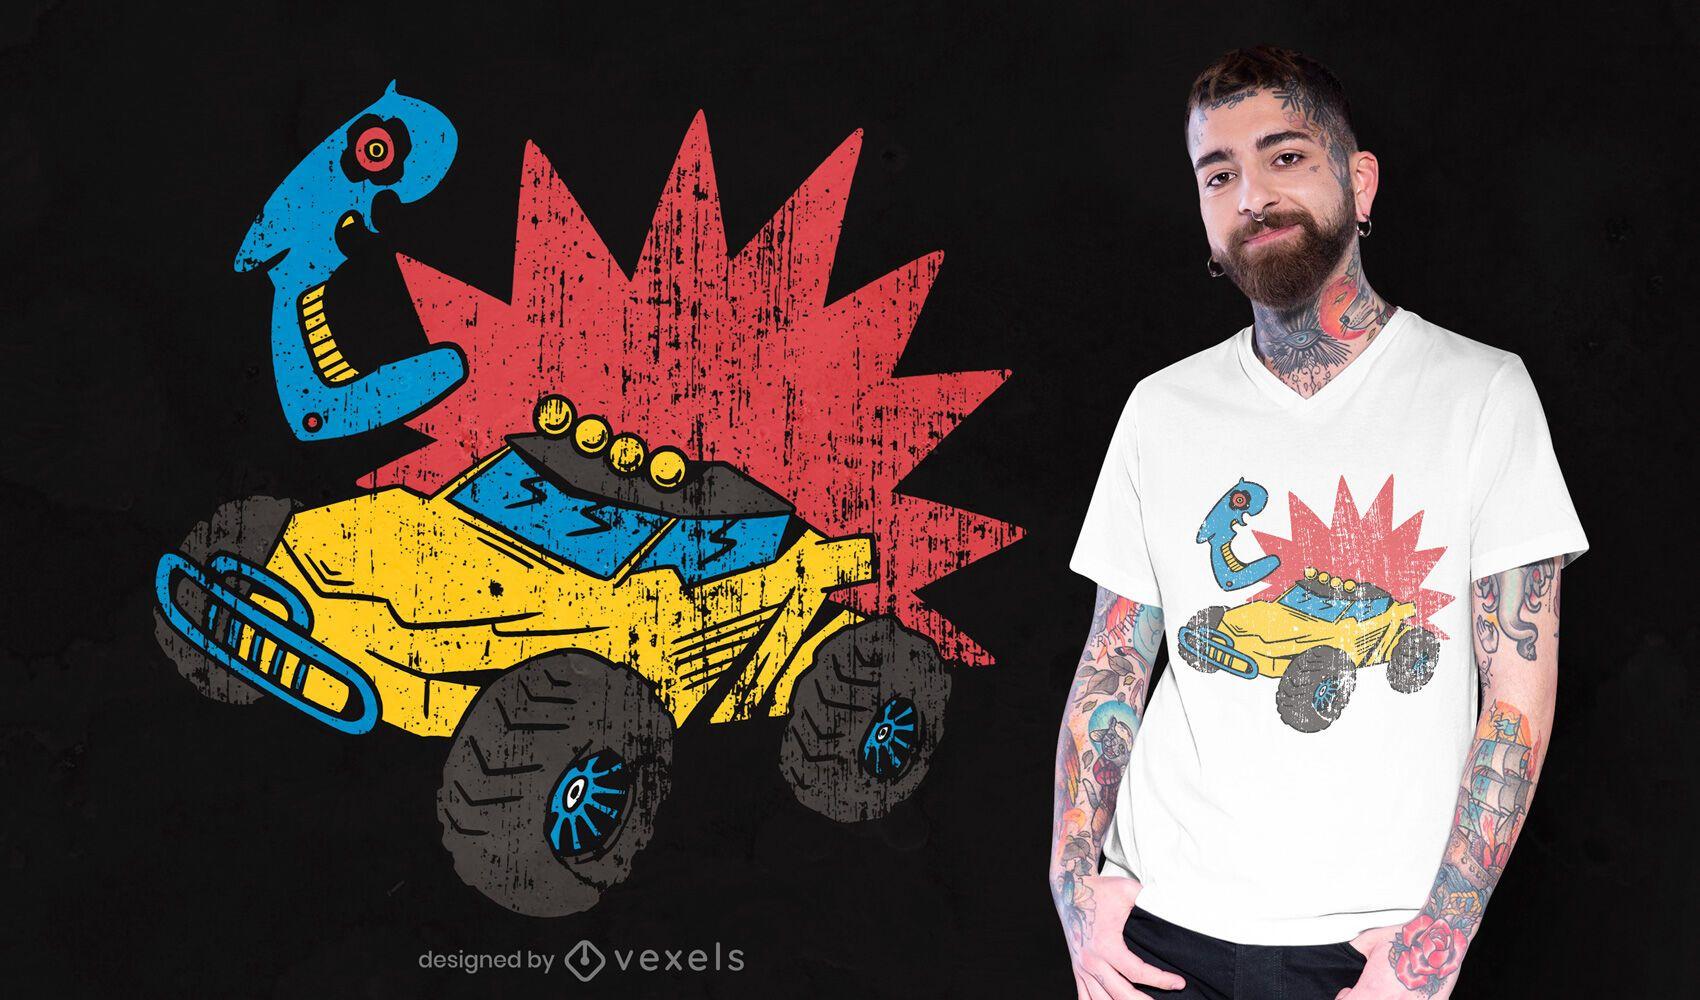 Remote control car t-shirt design